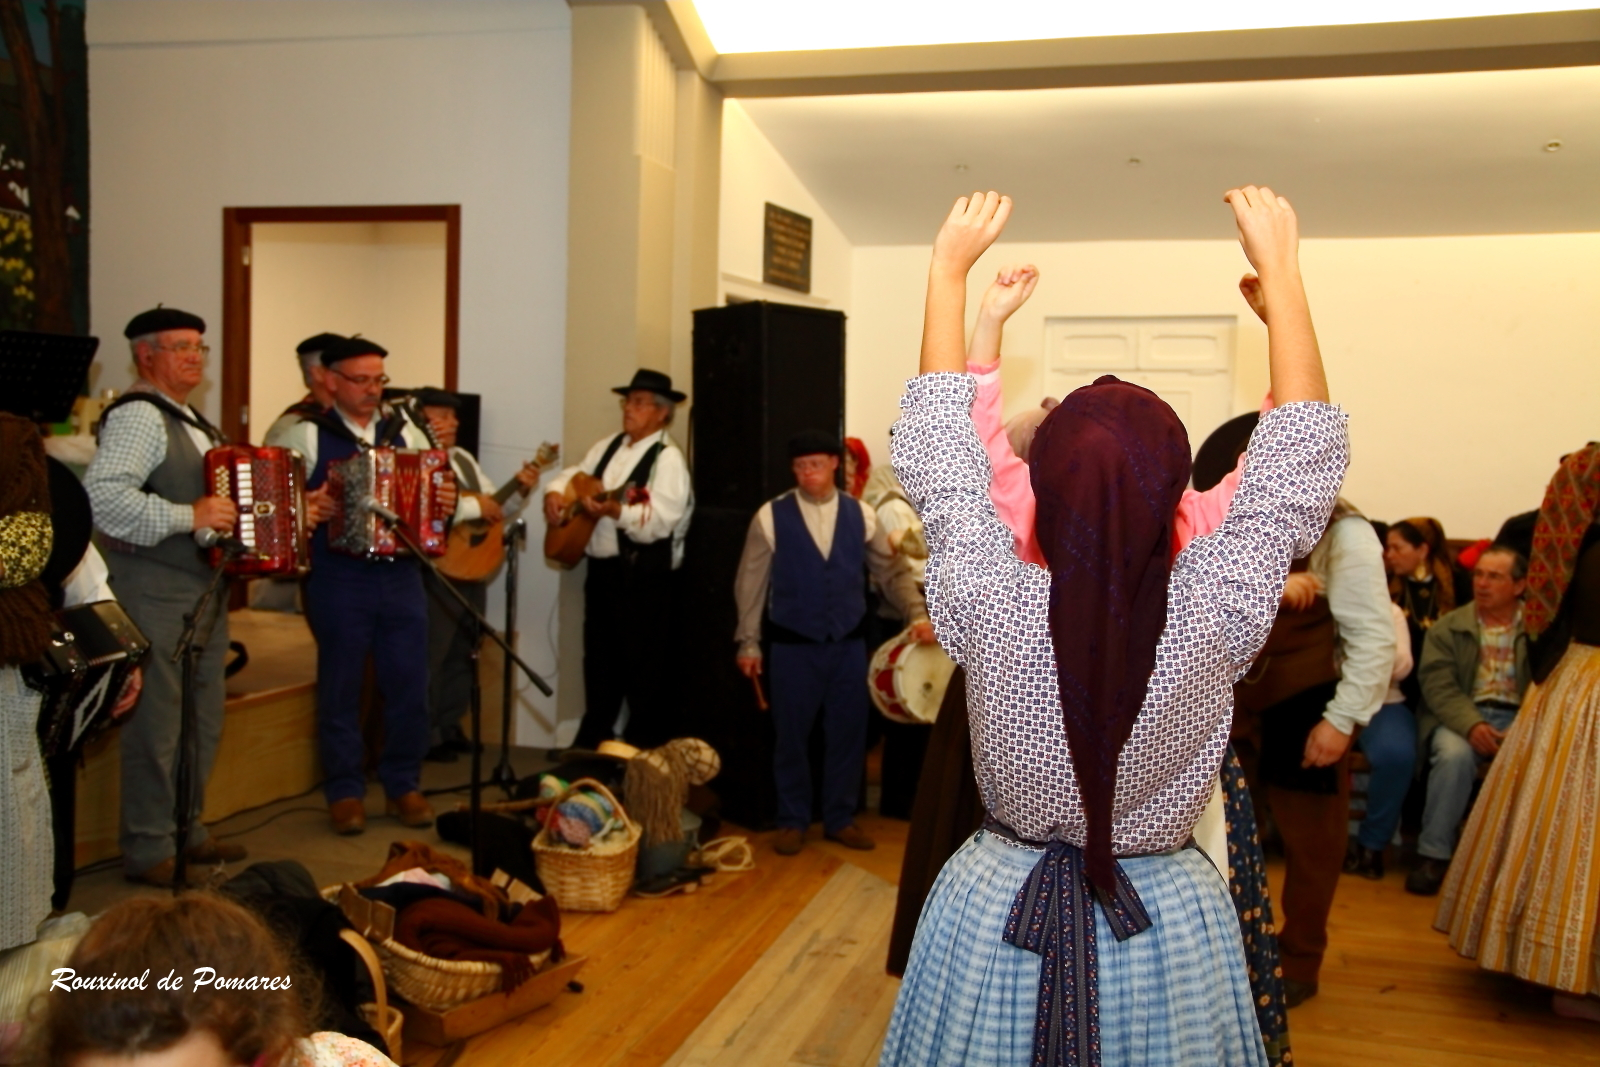 Festa Regionalista Casa da Comarca (009)